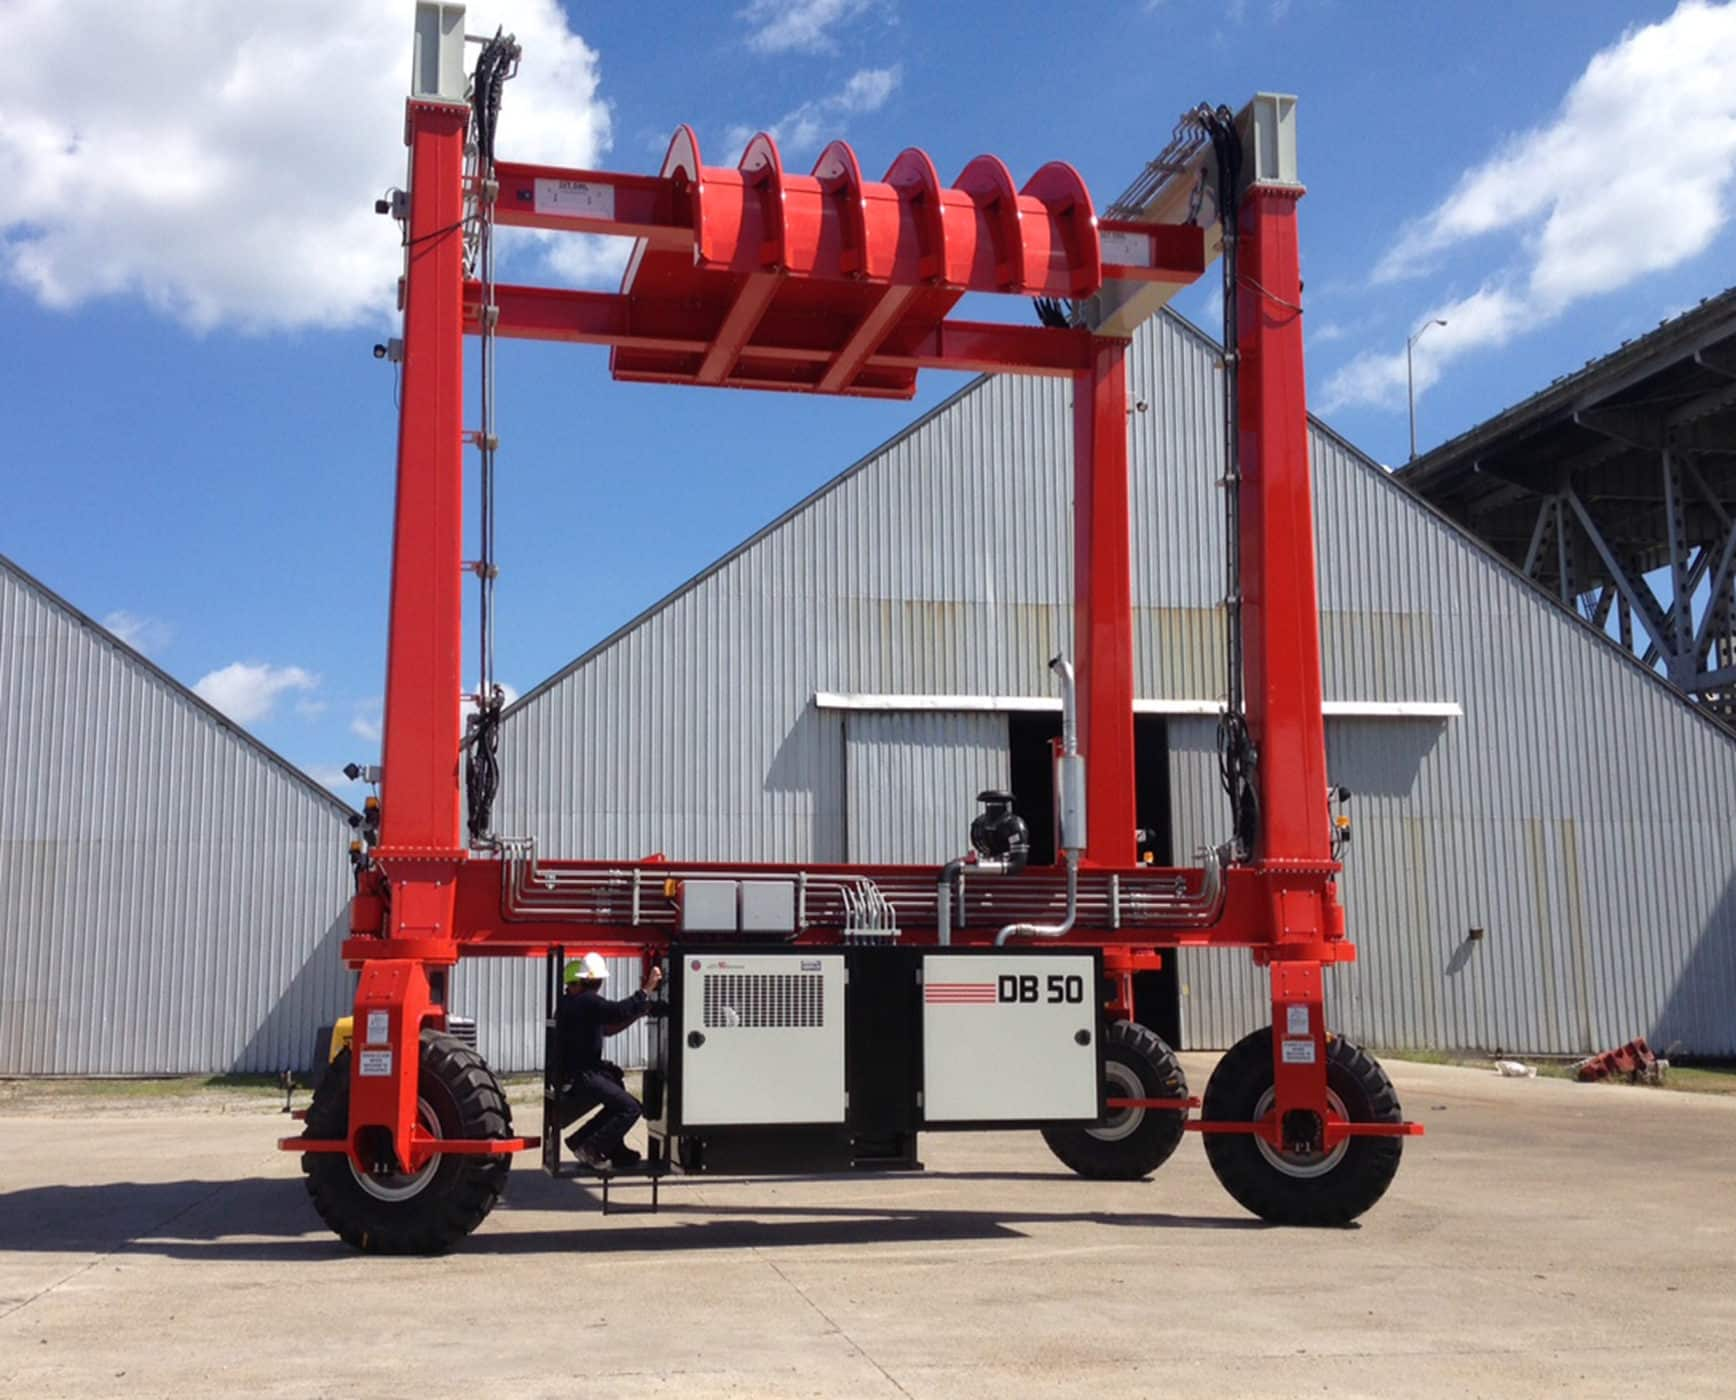 DB50 Mobile Gantry Crane with Spreader